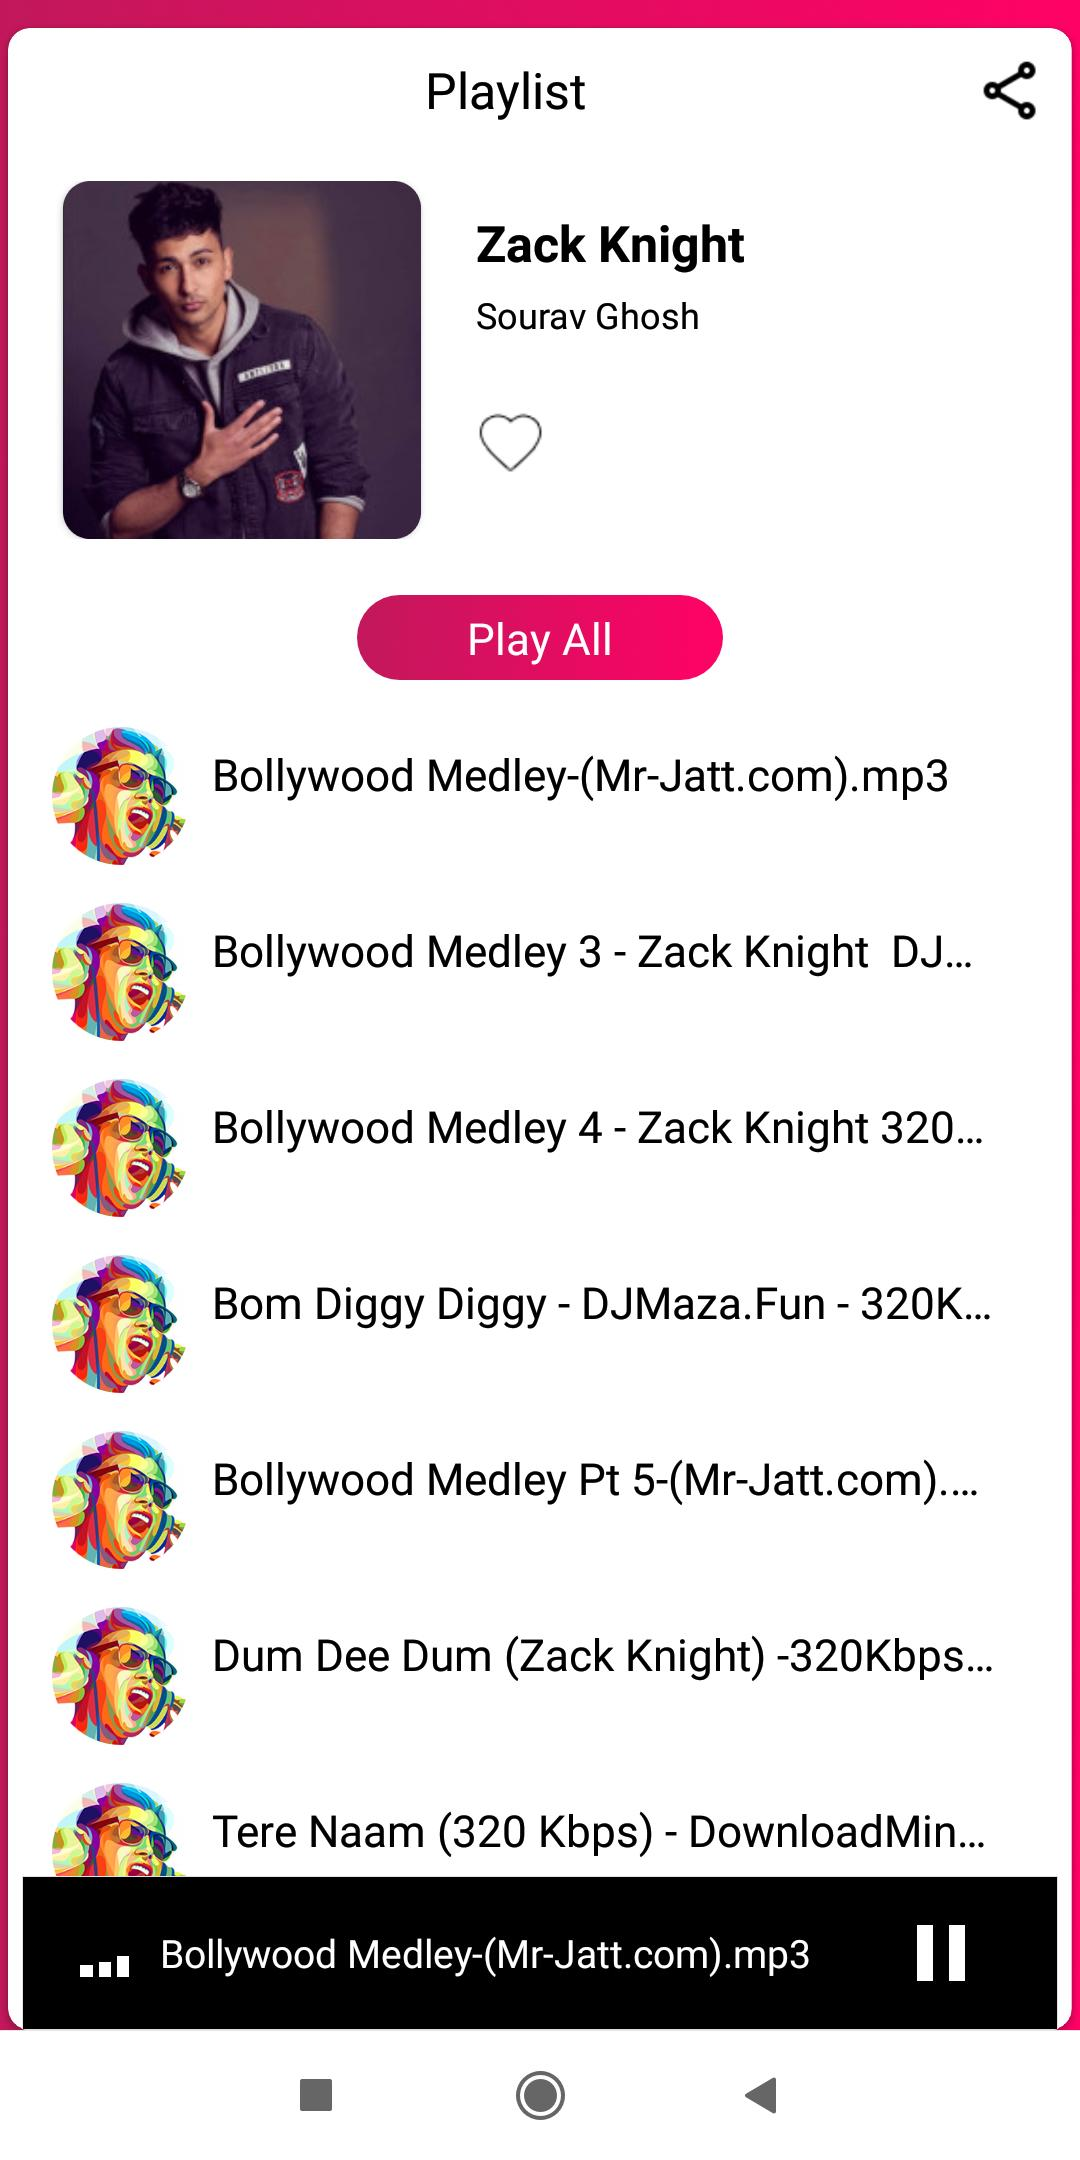 Bom diggy diggy full mp3 song download 320kbps